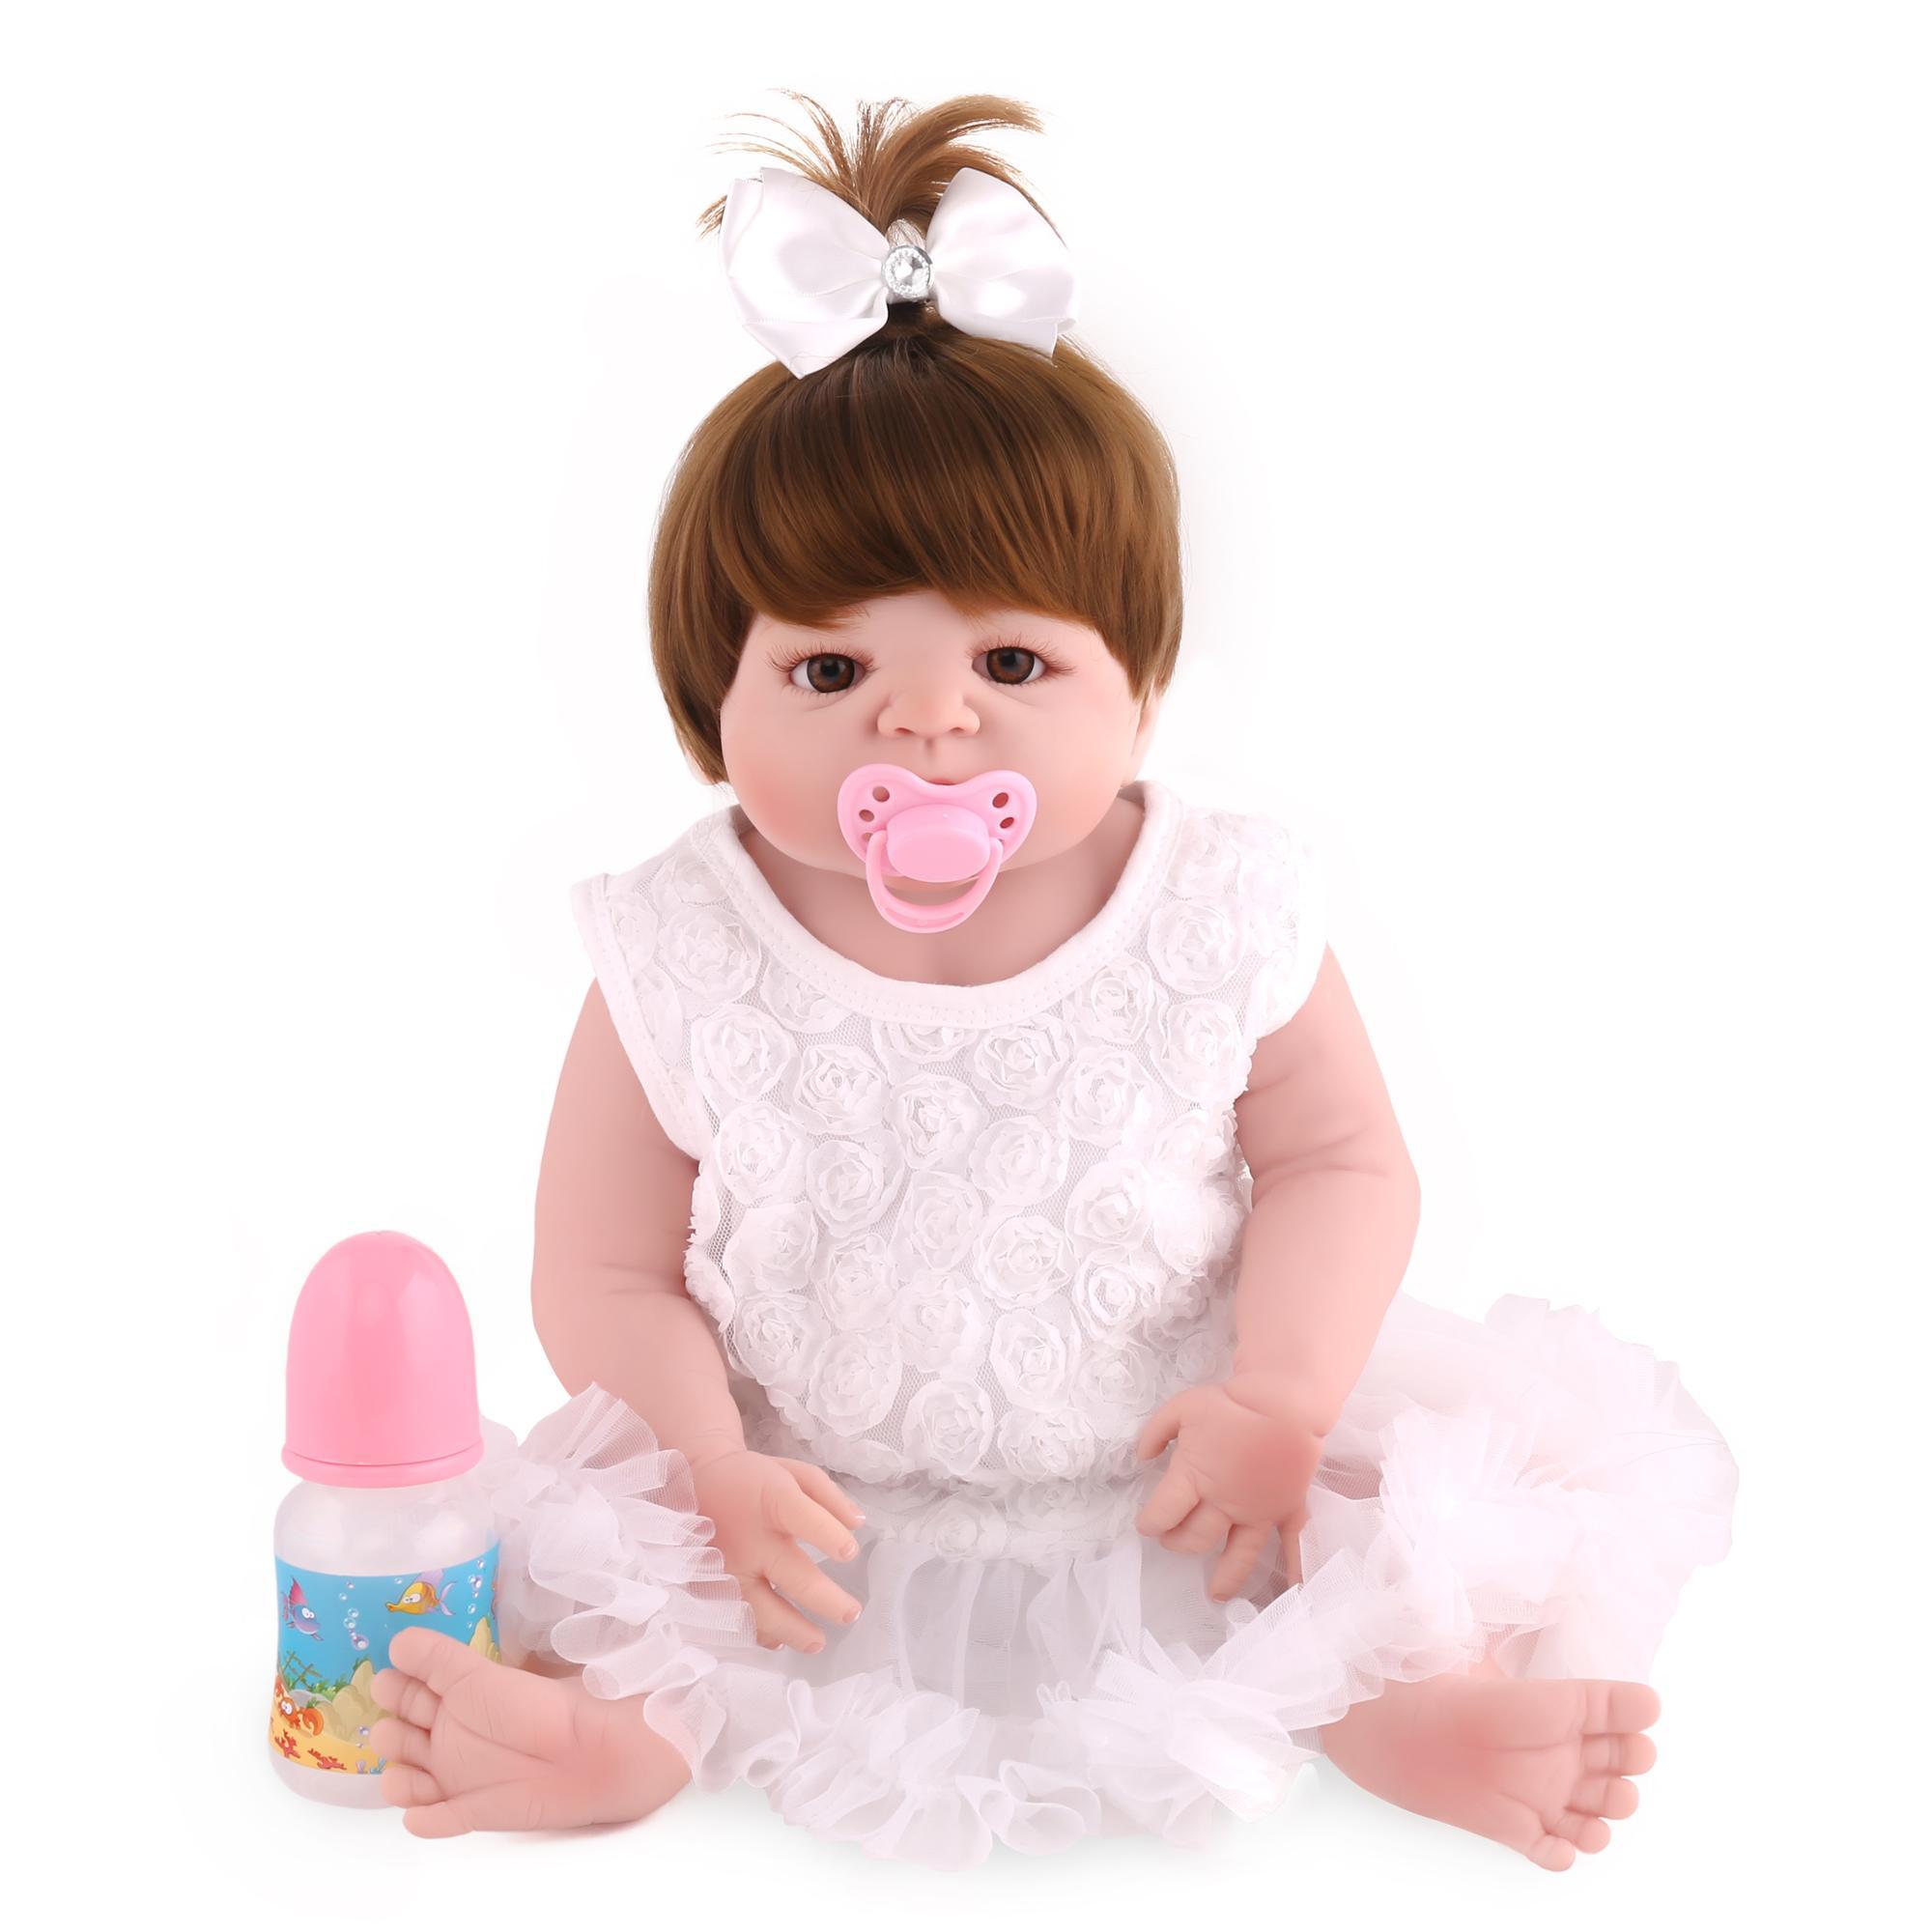 55 cm Tubuh Penuh Silikon Reborn Bayi Boneka Mainan Bayi Manusia Hidup  Reborn Boneka Putri 785302e0a0